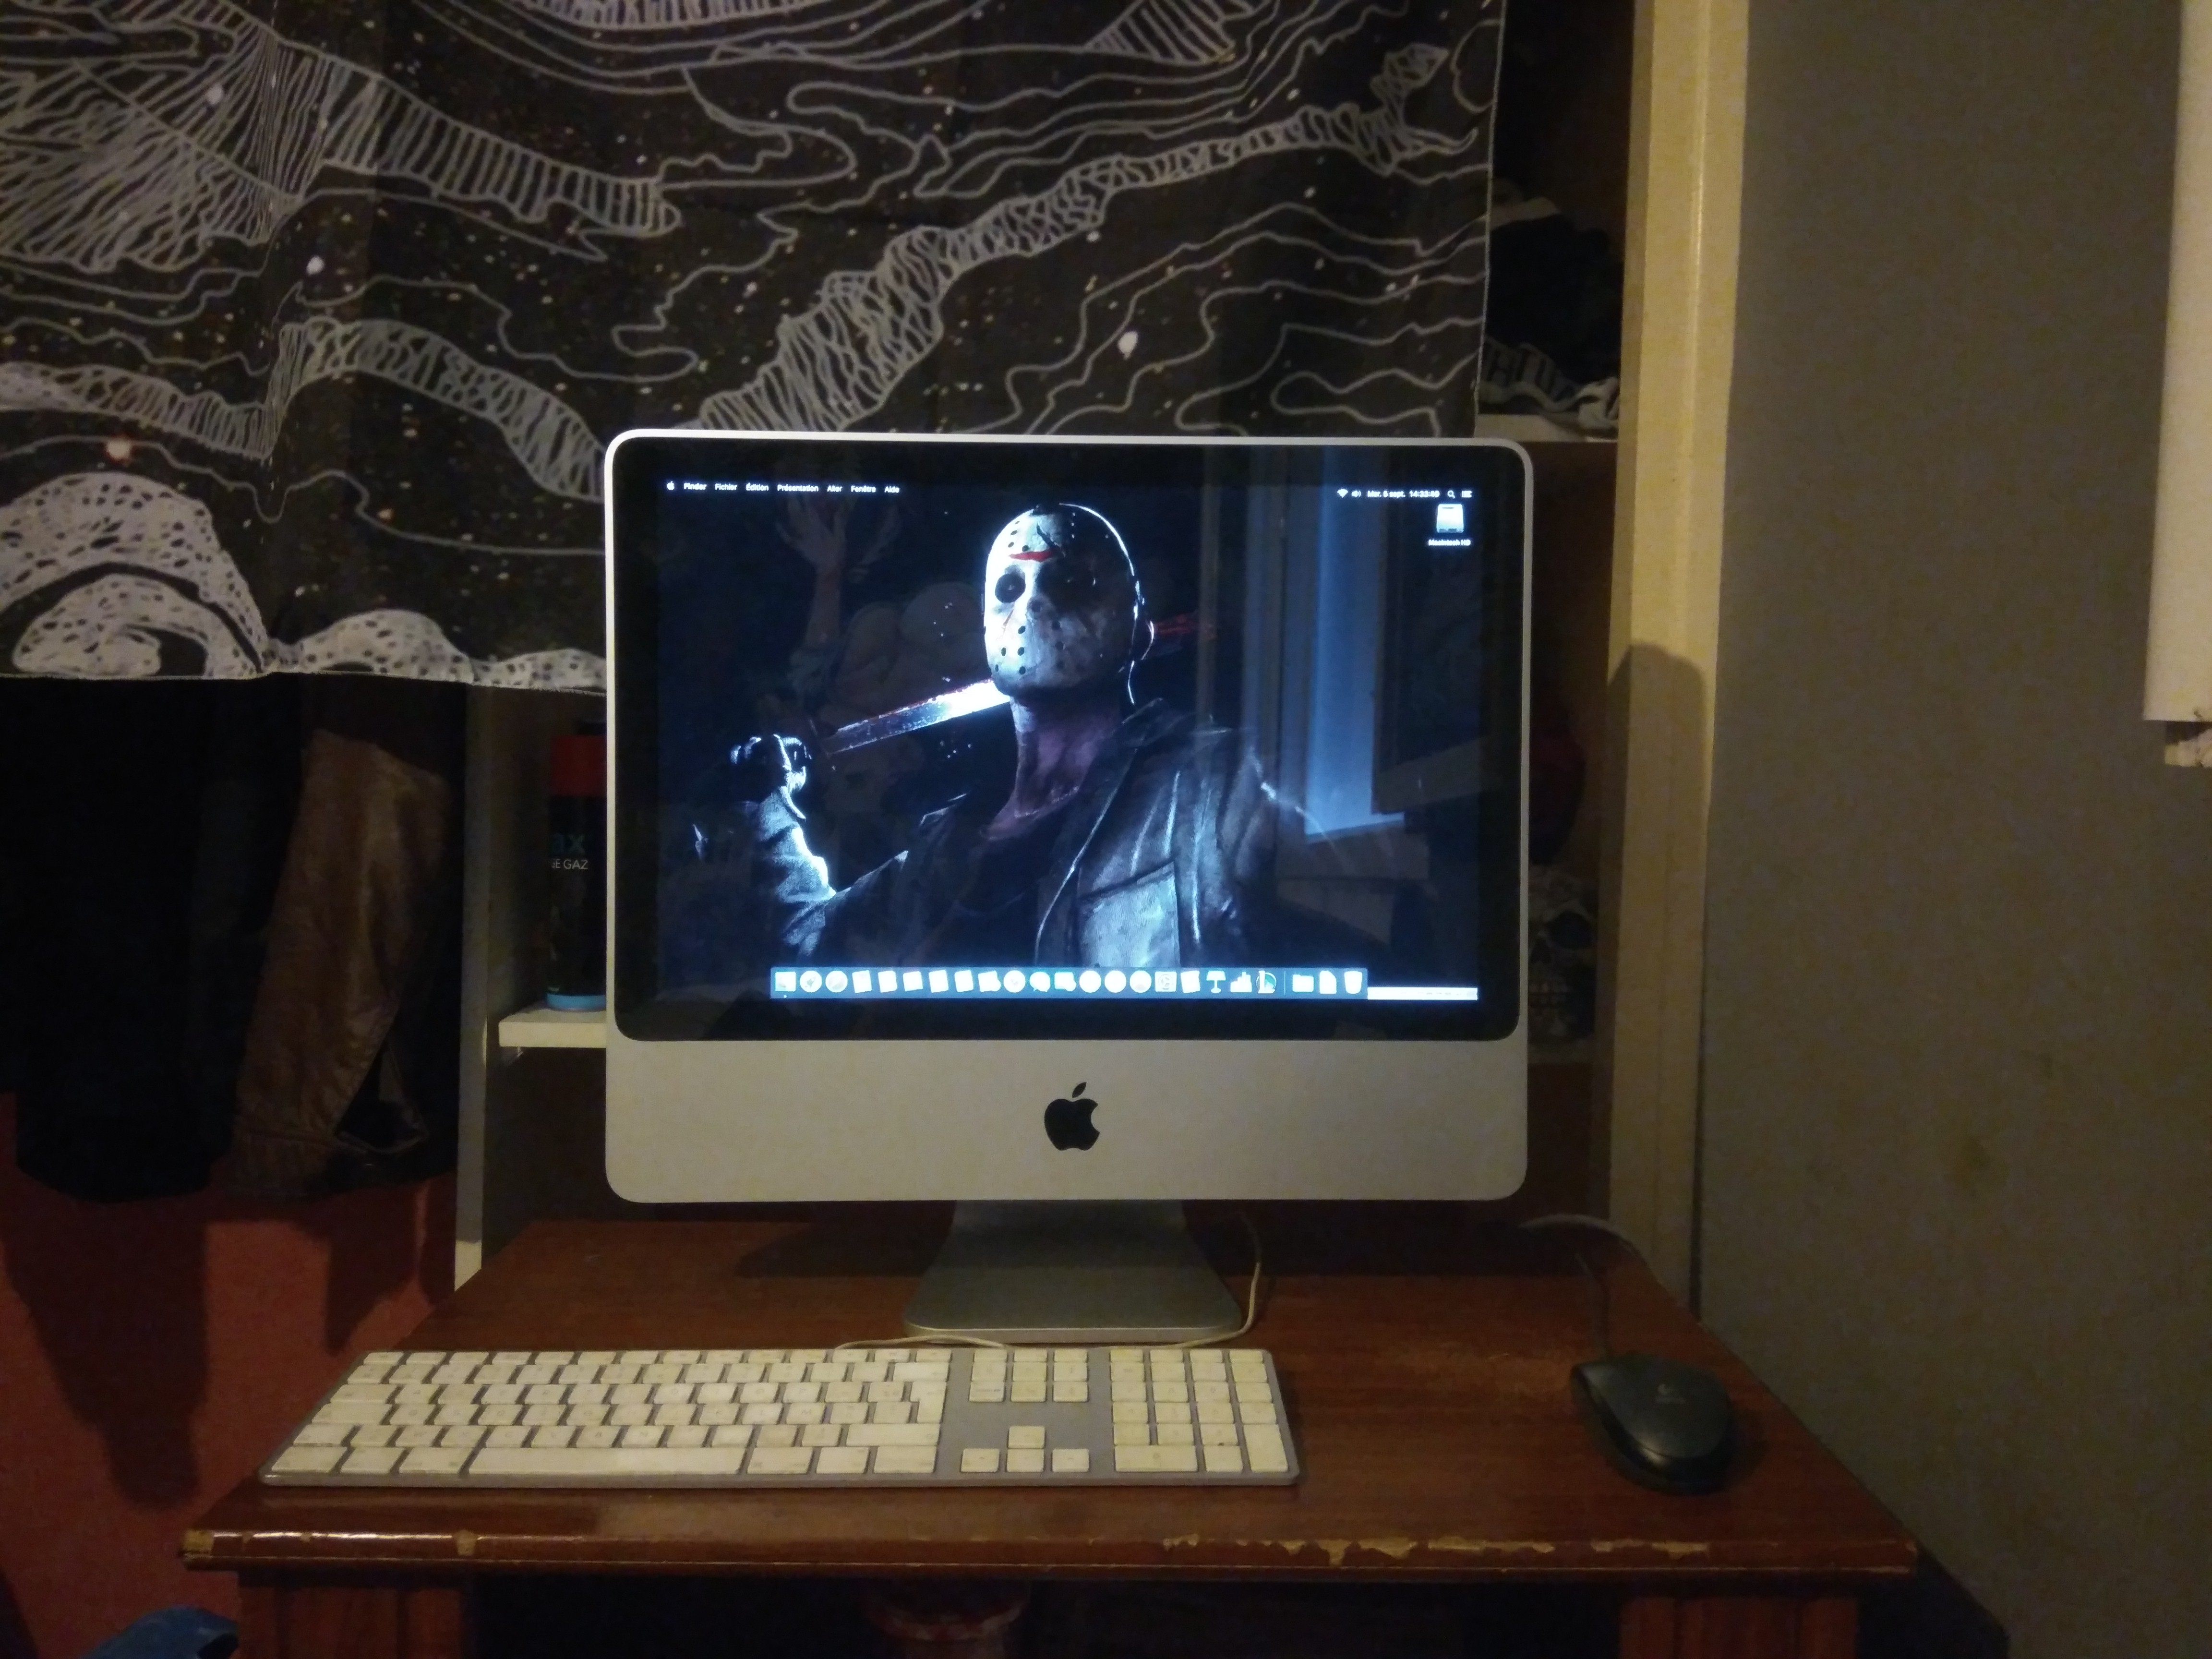 Post Your Mac Setup: Past & Present (Part 20) | Page 115